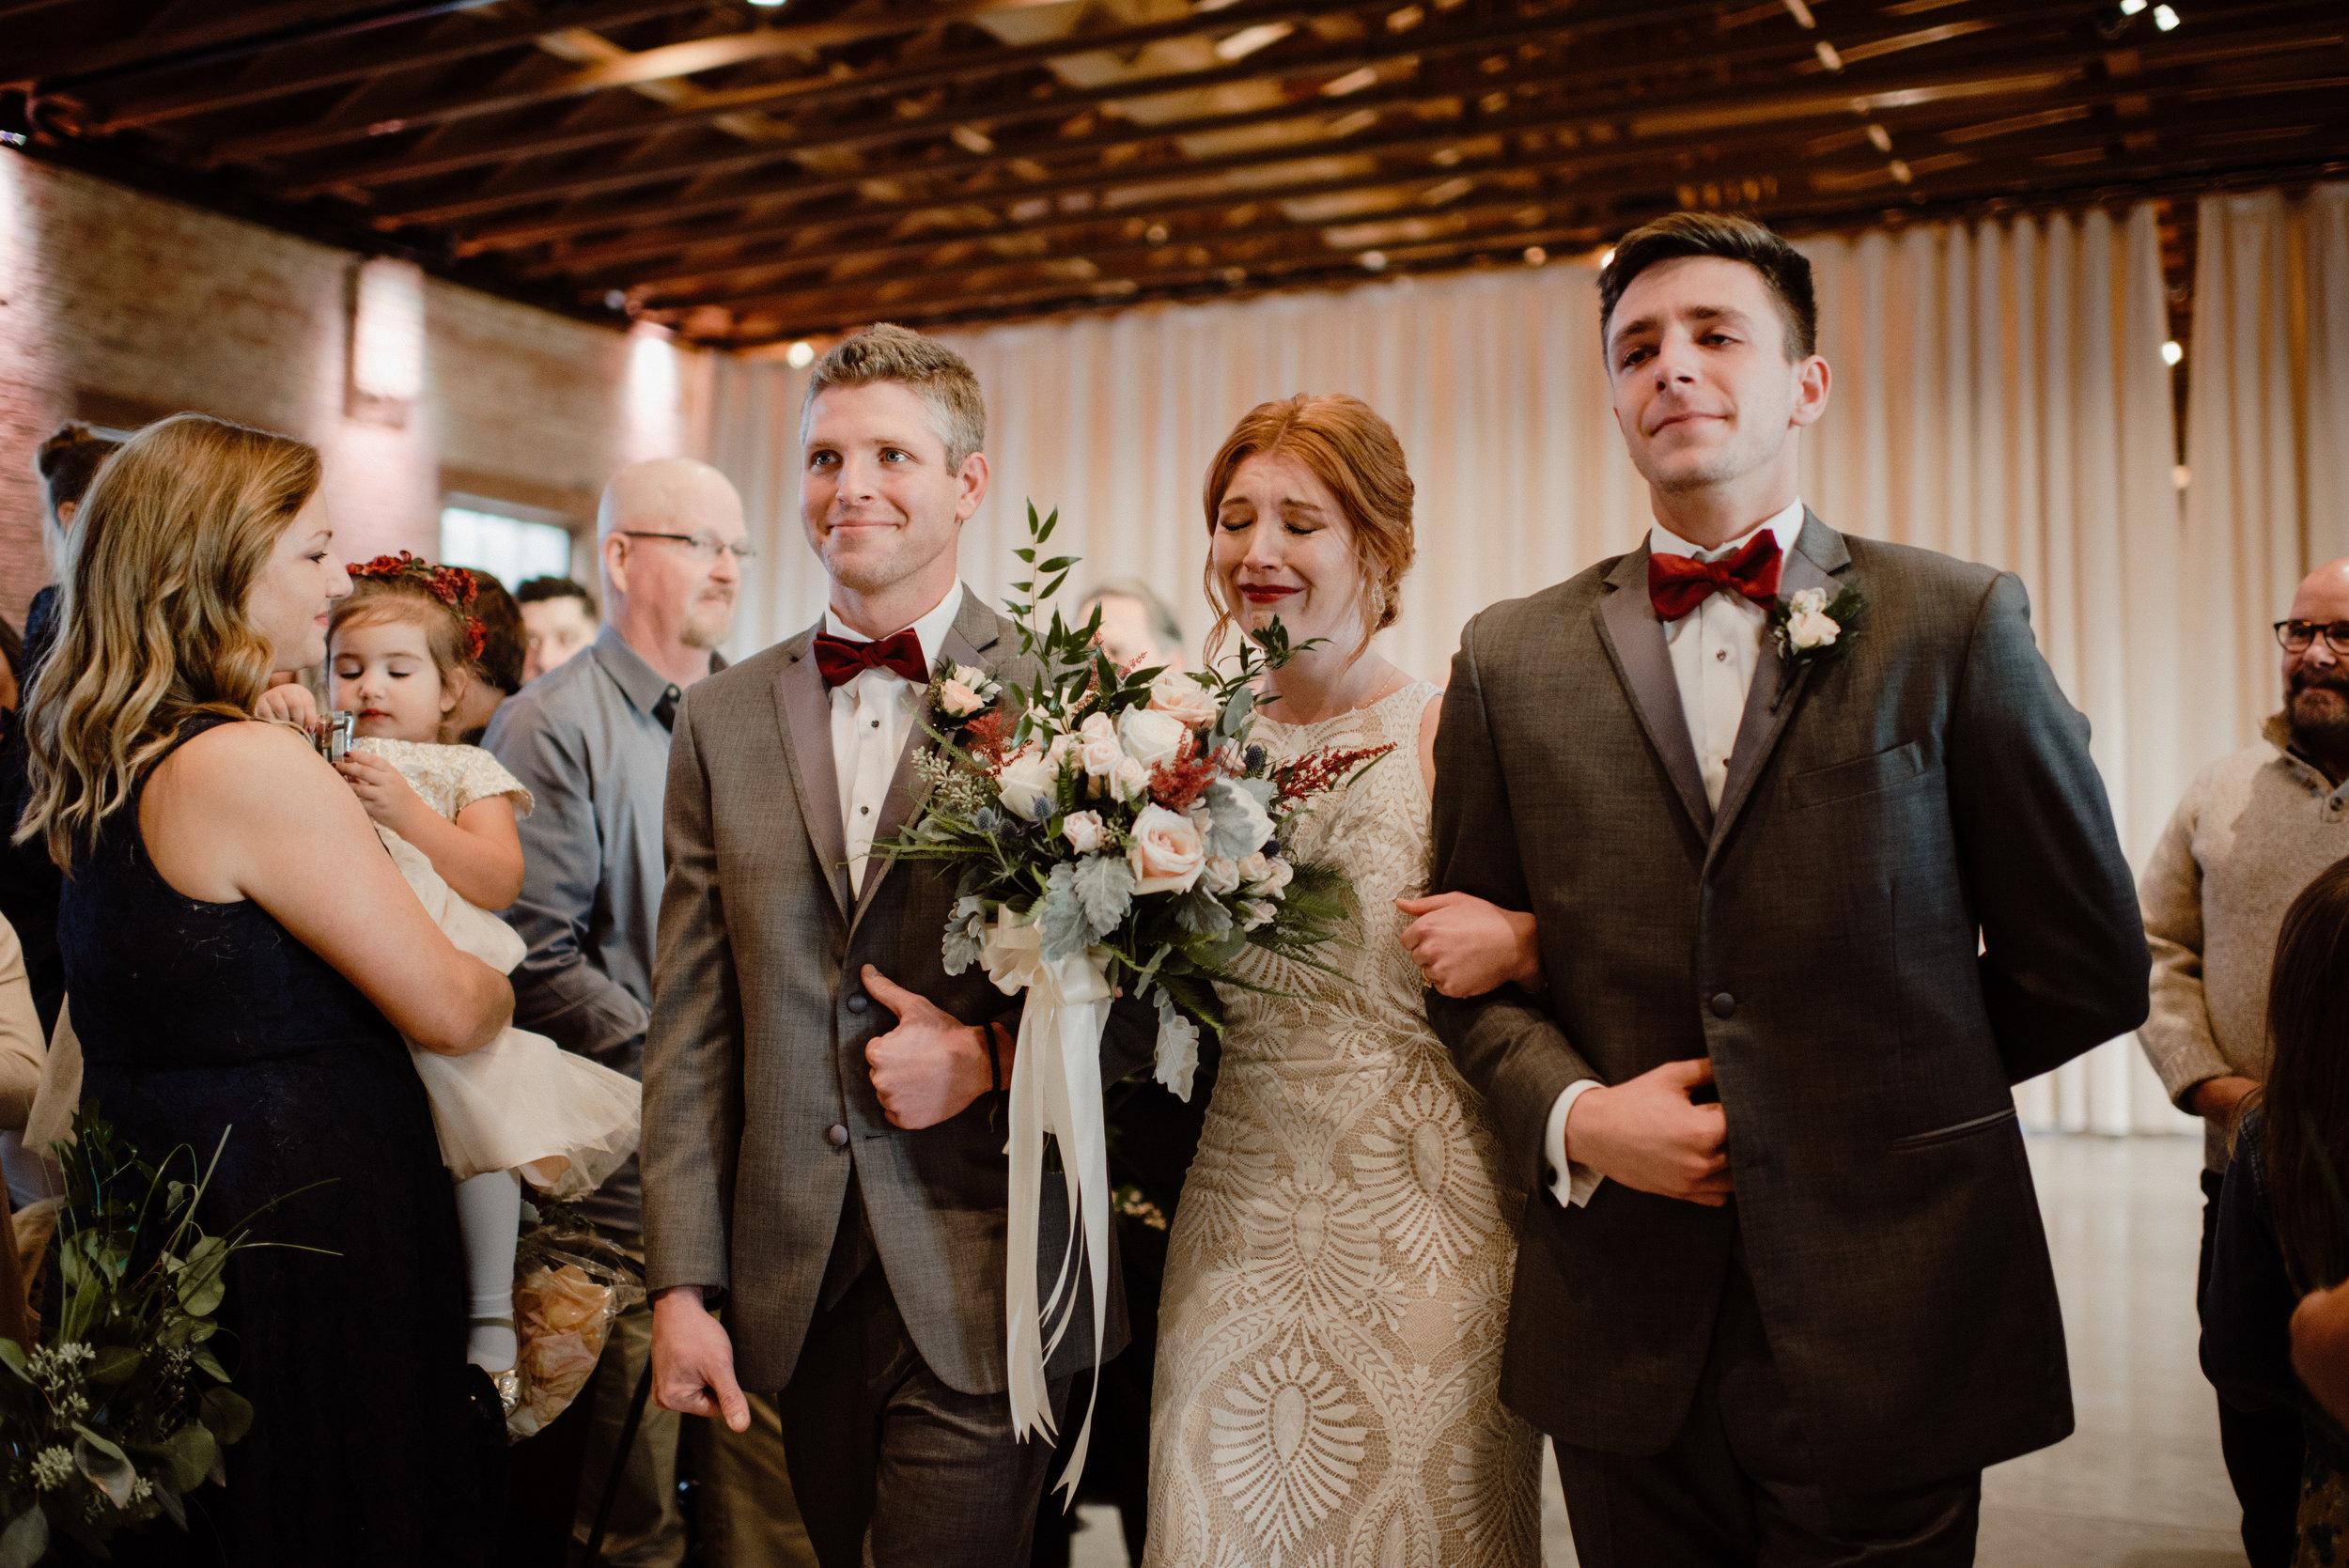 The Brix on Fox, Chicago Wedding Photographer, Zach and Rosalie00003.jpg